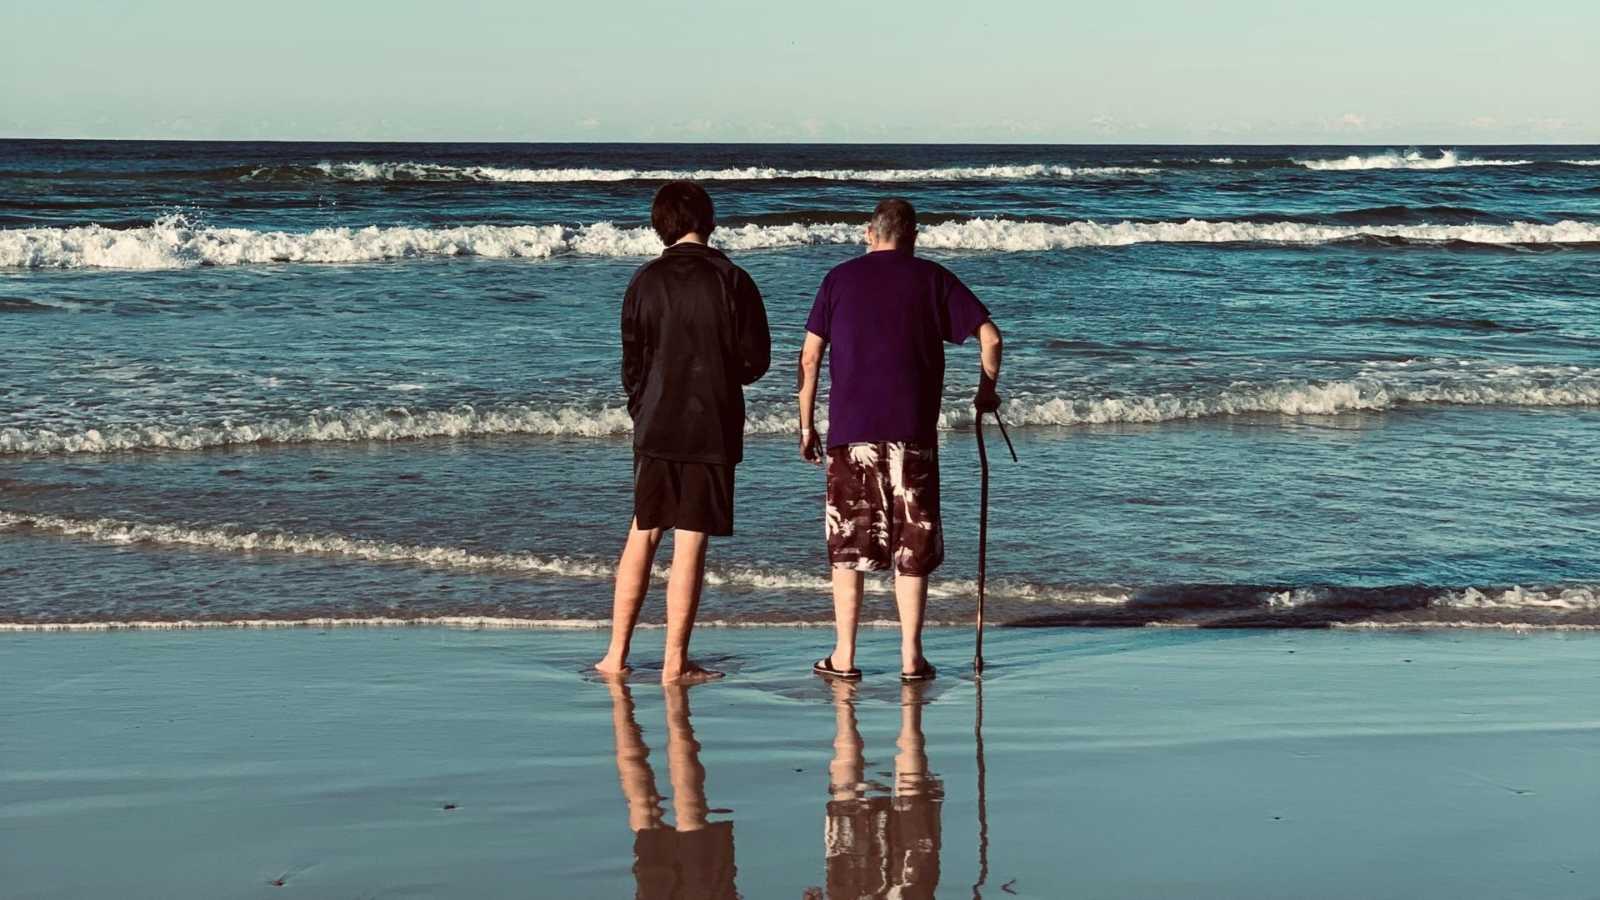 Man with terminal illness enjoys final days on beach with friends